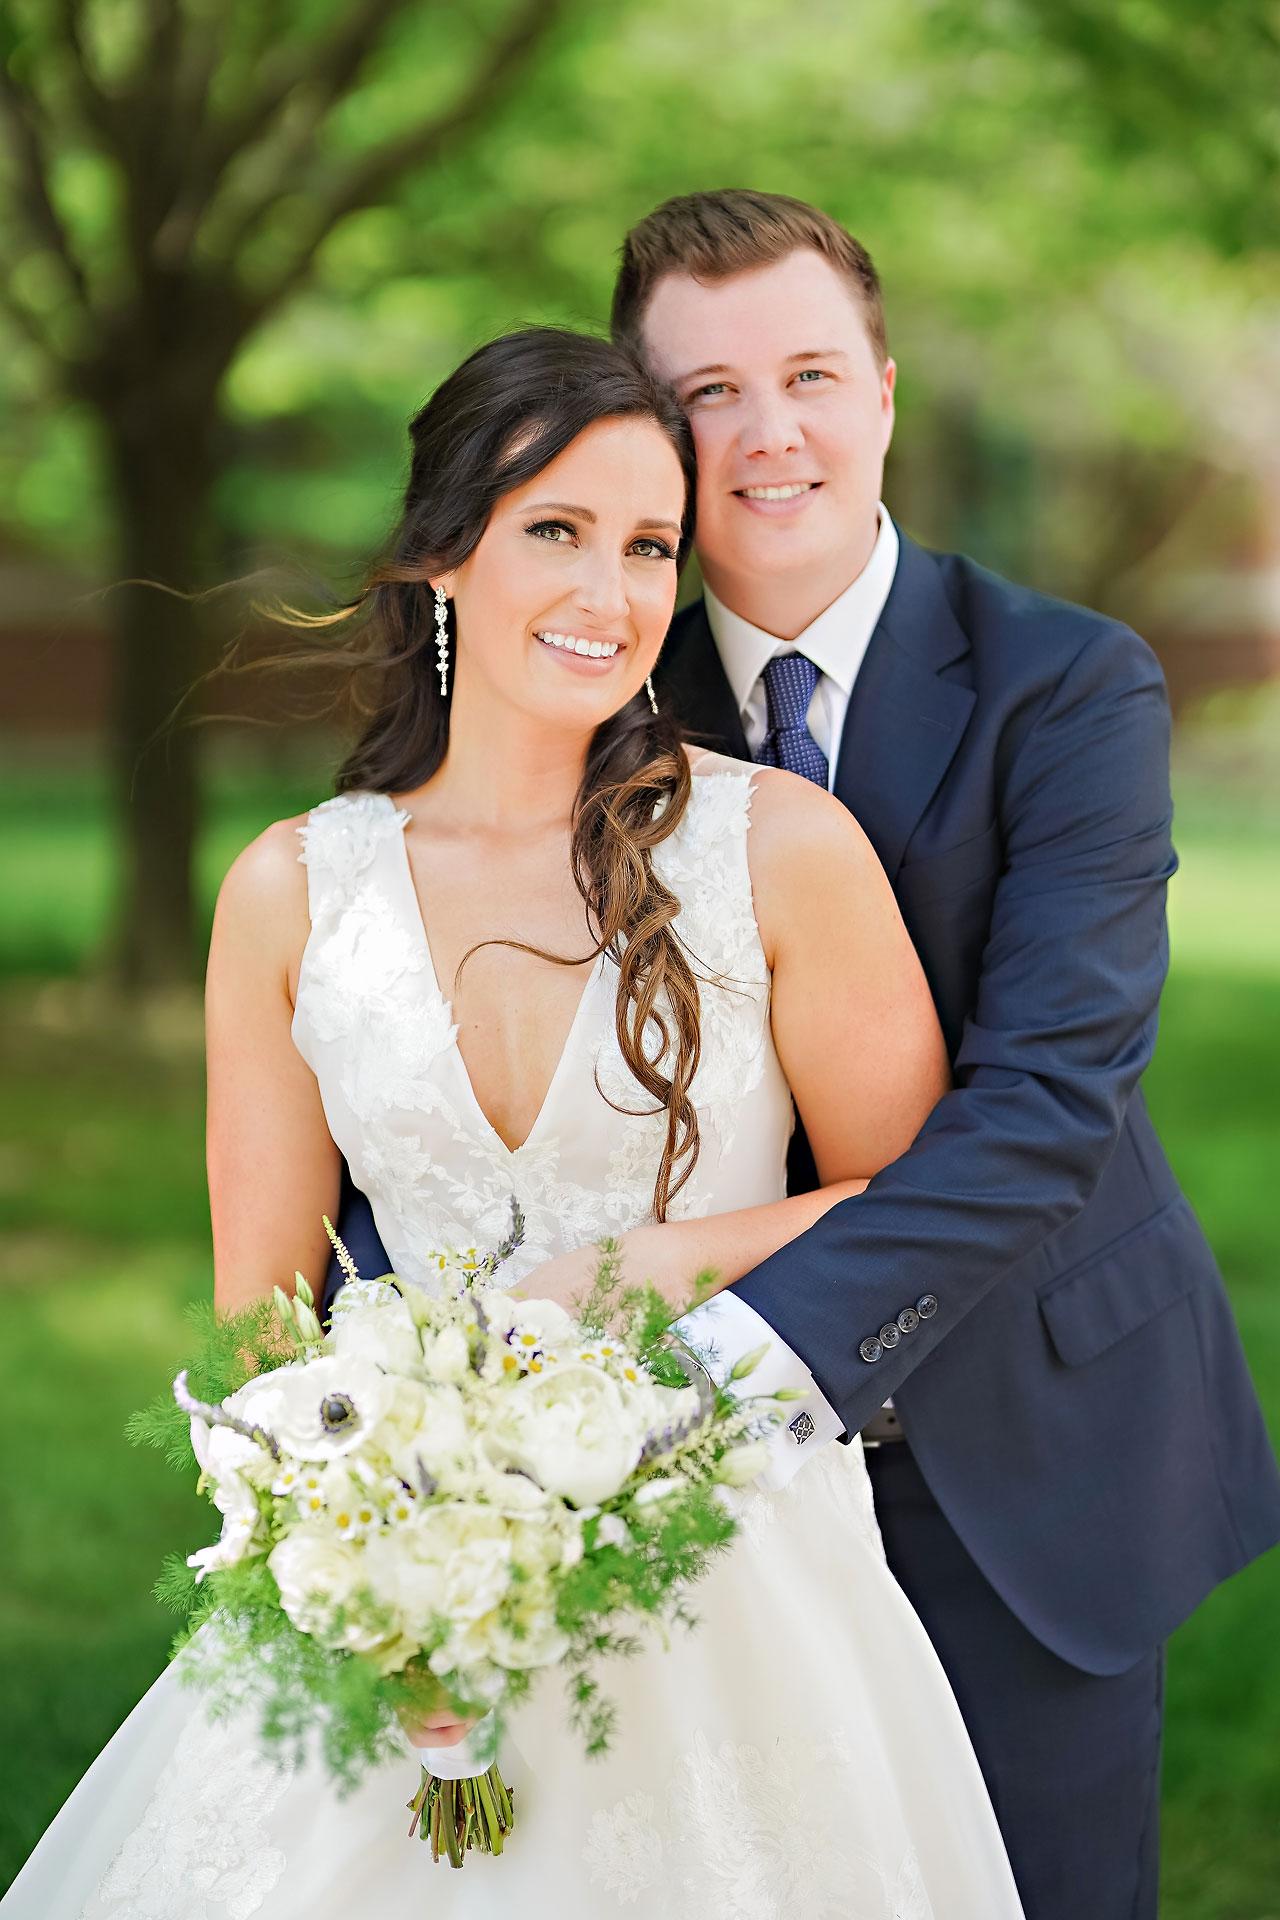 MacKinze John Lafayette Indiana Purdue Wedding 120